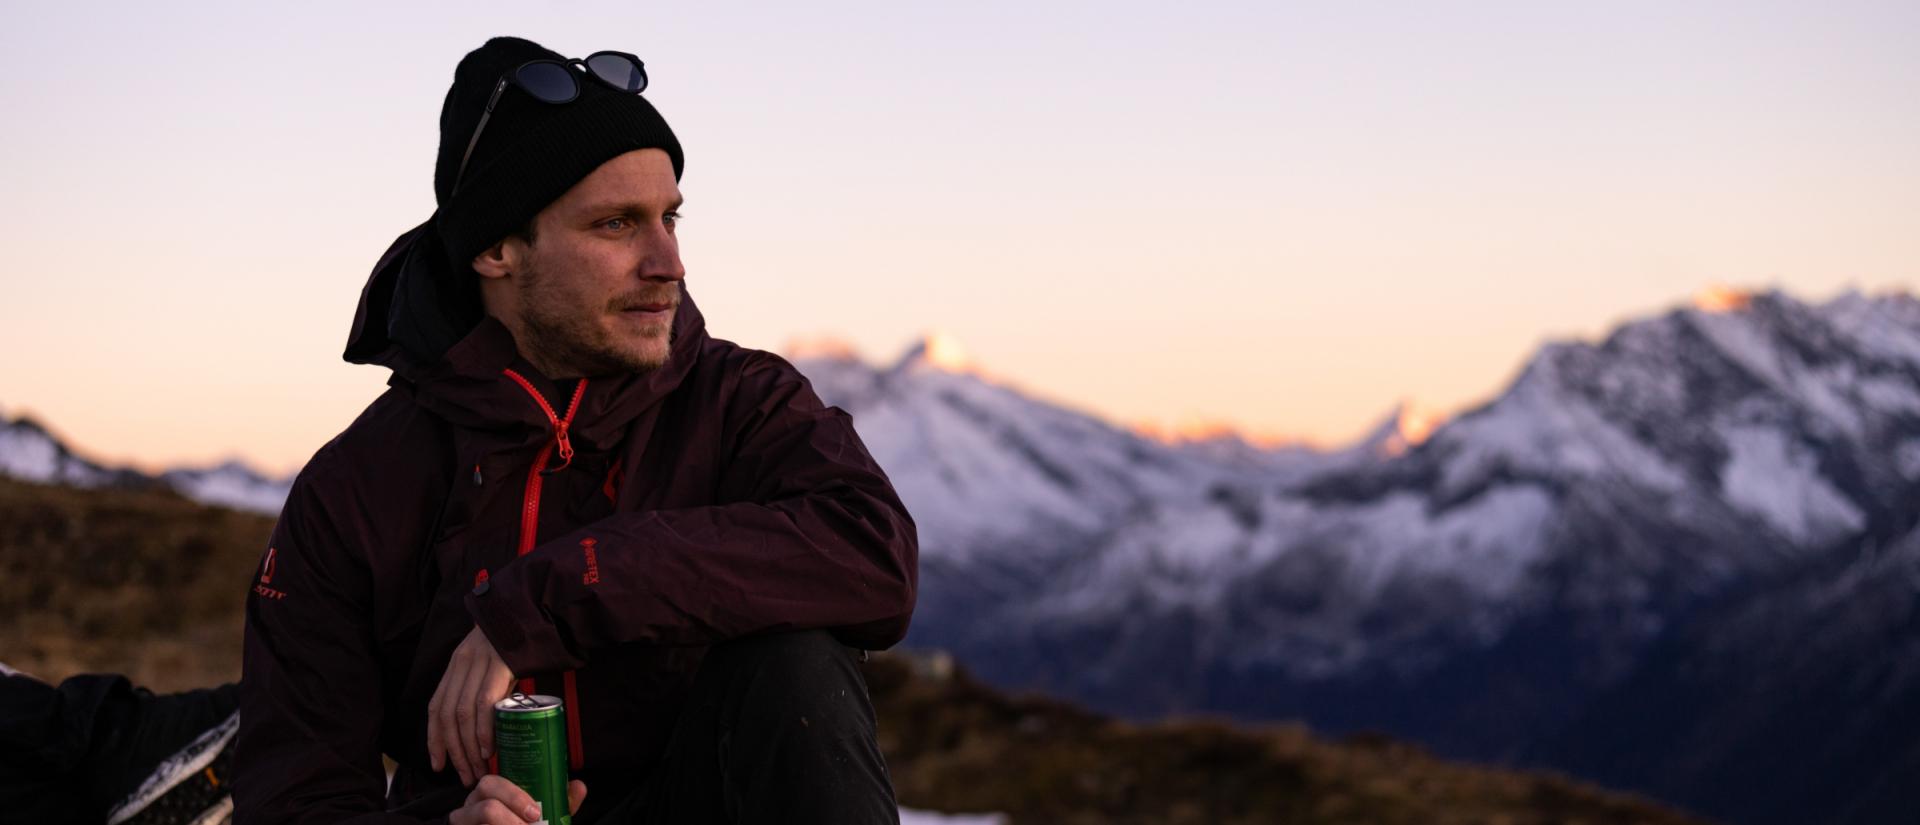 Lukas Ebenbichler, Ski, Tourengehen